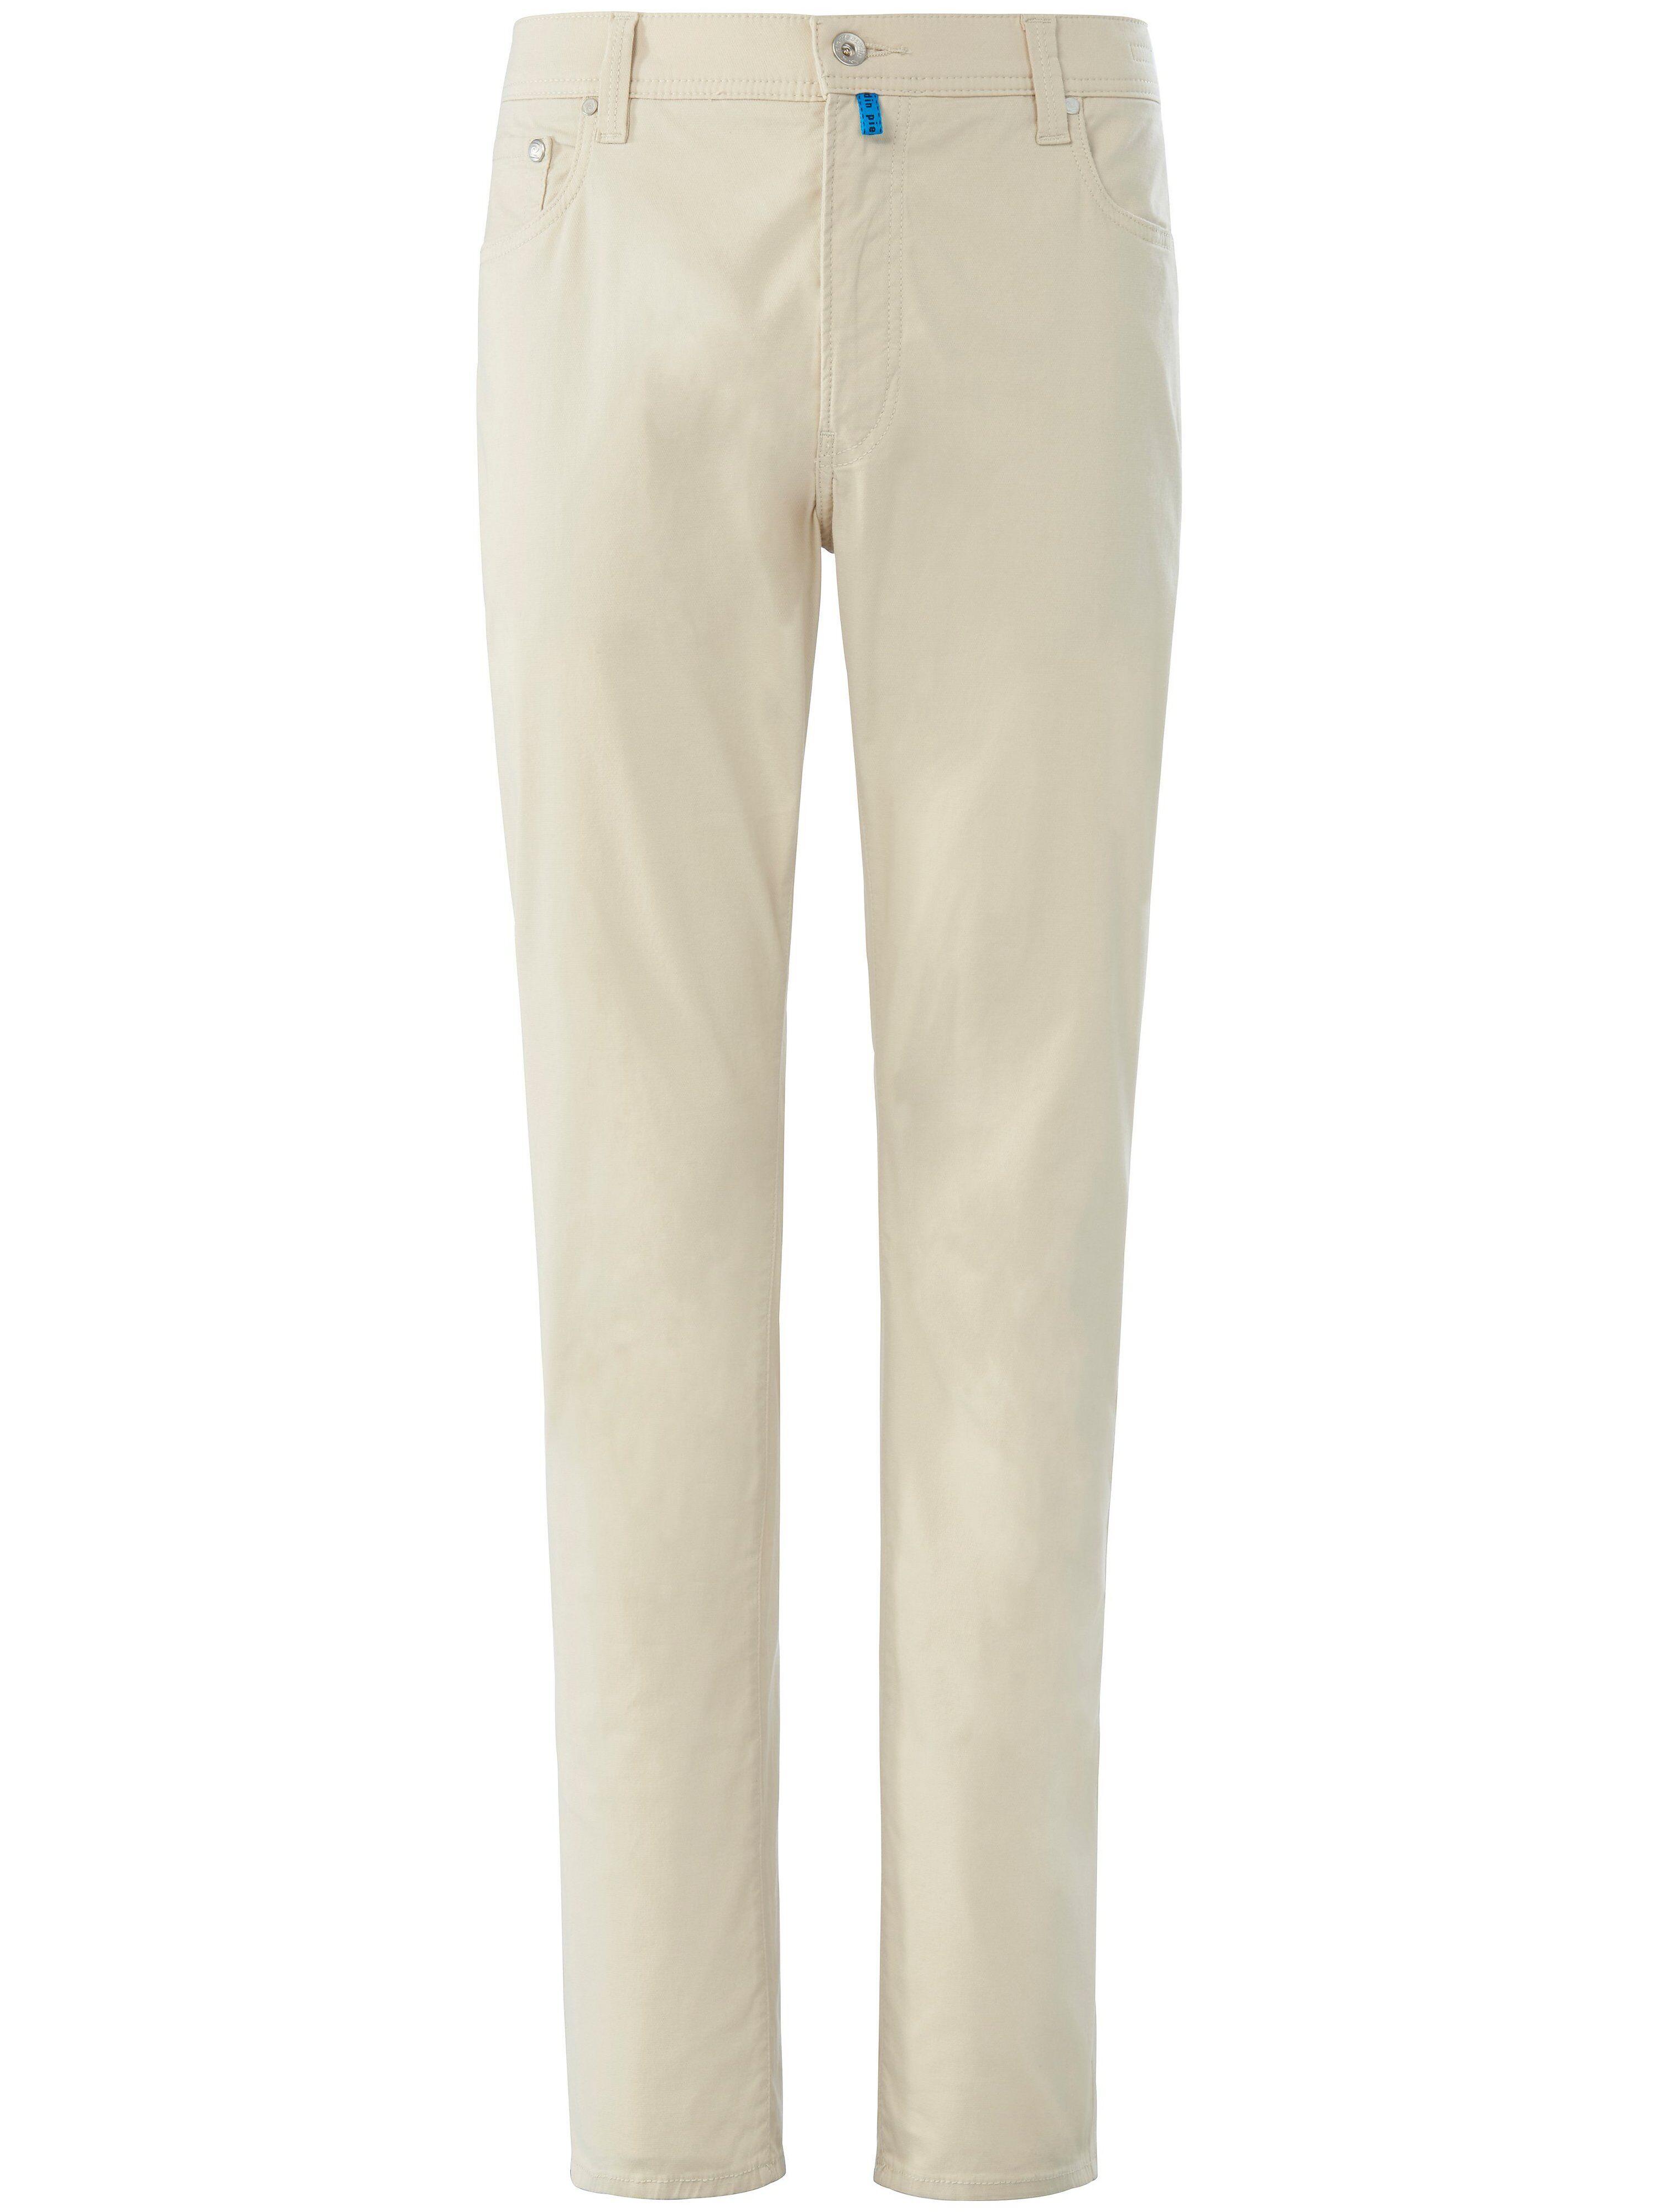 Pierre Cardin Le pantalon Regular Fit modèle Lyon Tapered  Pierre Cardin beige  - Homme - 25